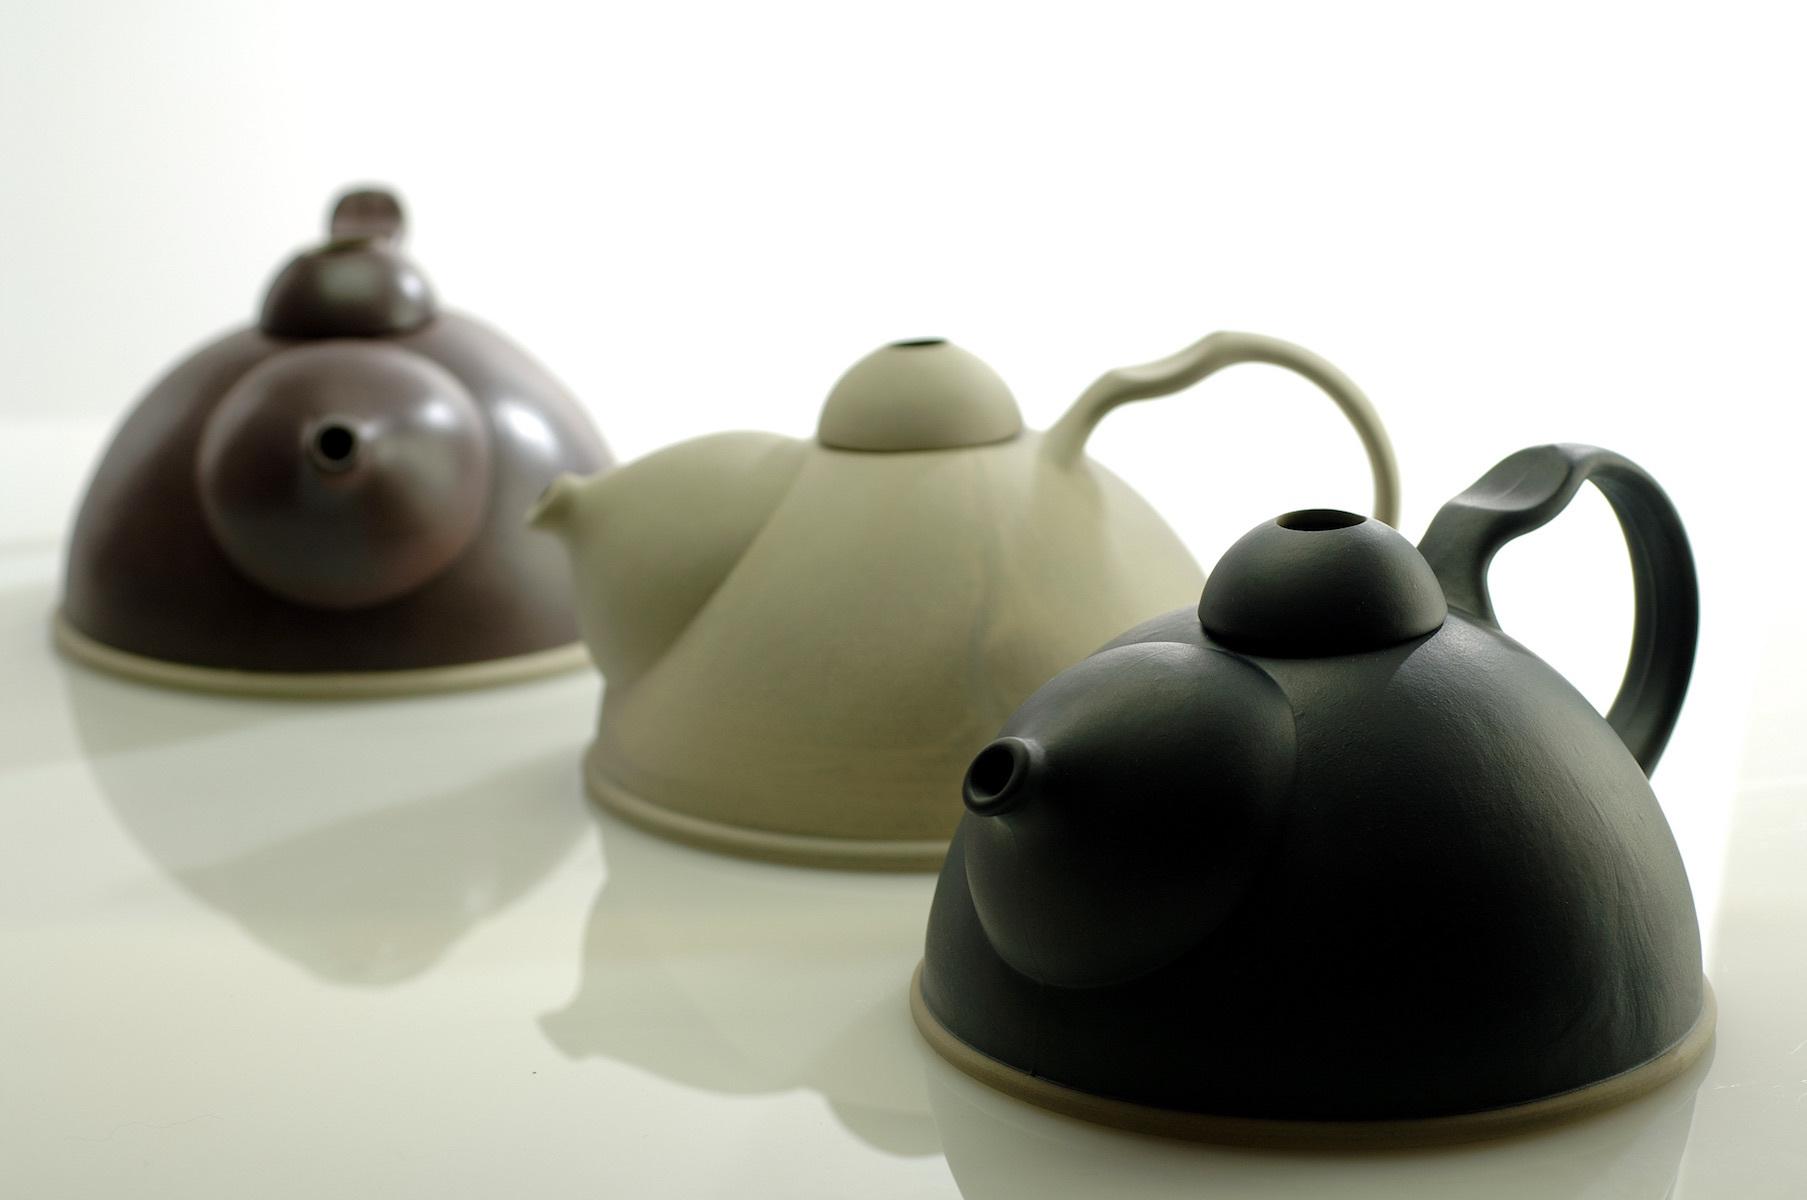 ceramiche-bucci-ceramists-pesaro-pesaro-e-urbino-thumbnail